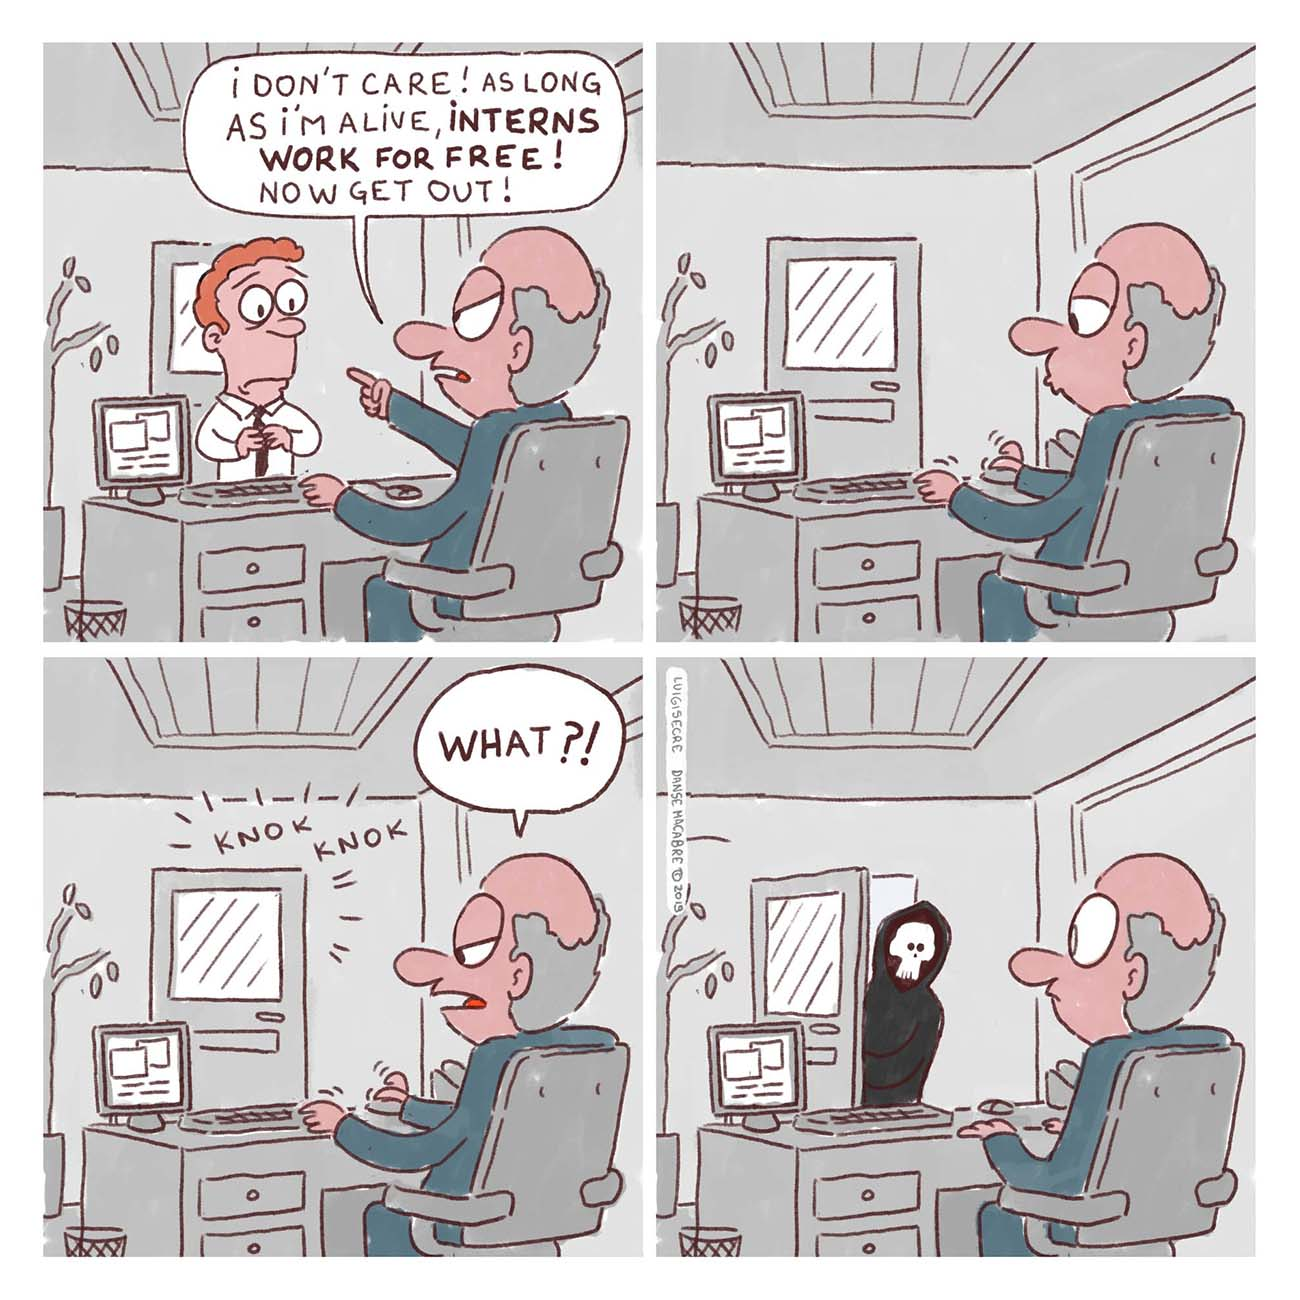 Contenuti_Low_Res_Luigi_Segre_Cartoons_2019_Danse_Macabre_22.jpg